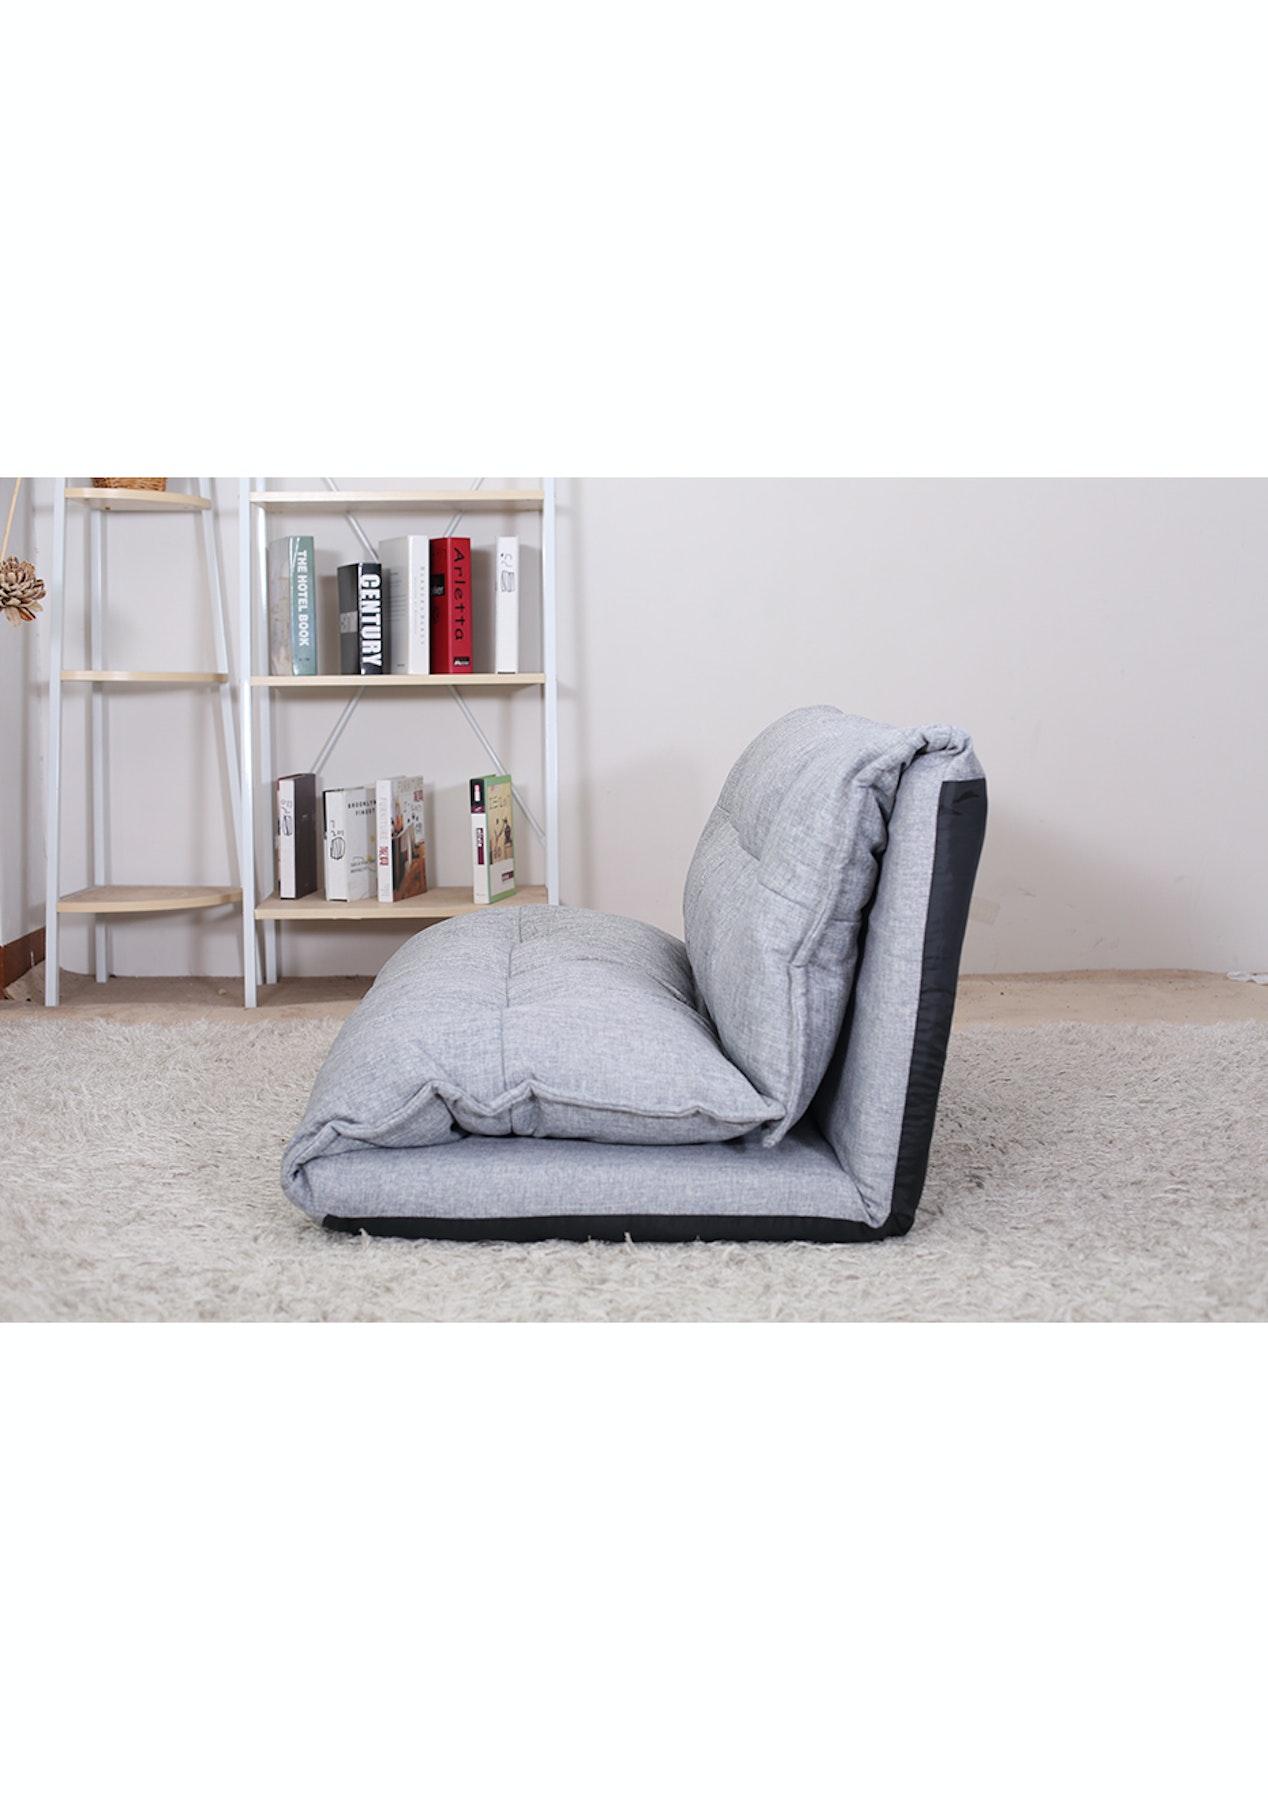 Astounding Double Folding Sofa Lounge Chair Grey Cjindustries Chair Design For Home Cjindustriesco